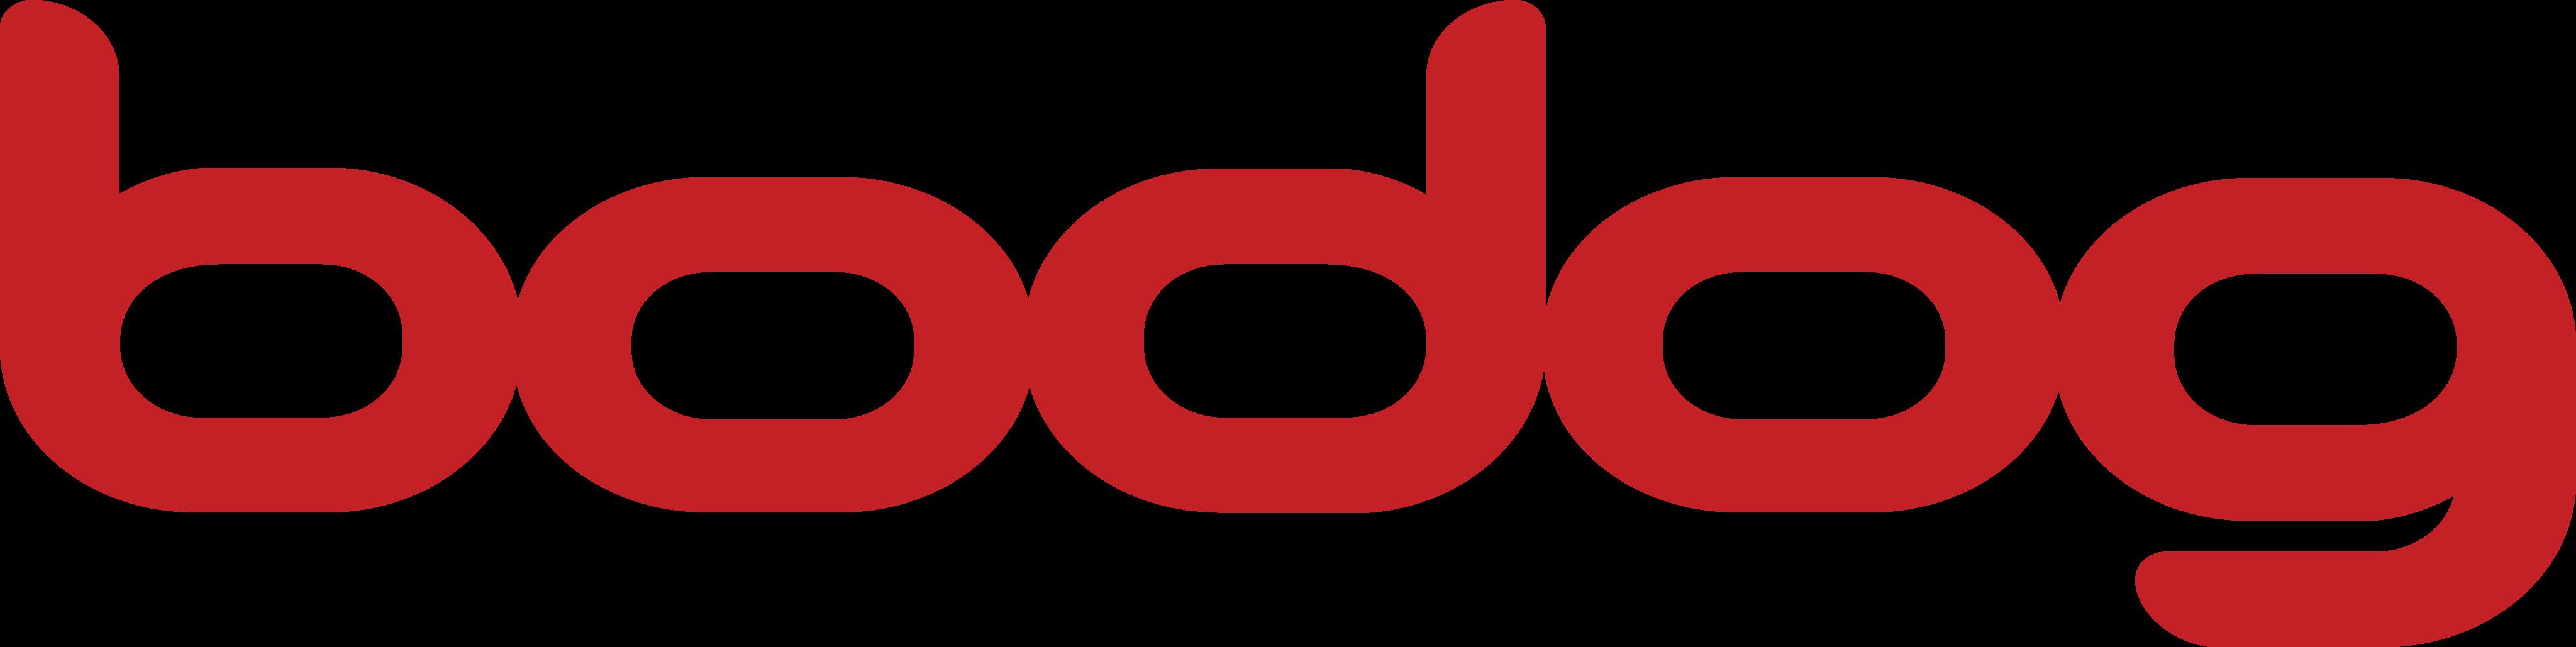 bodog logo - Bodog Logo